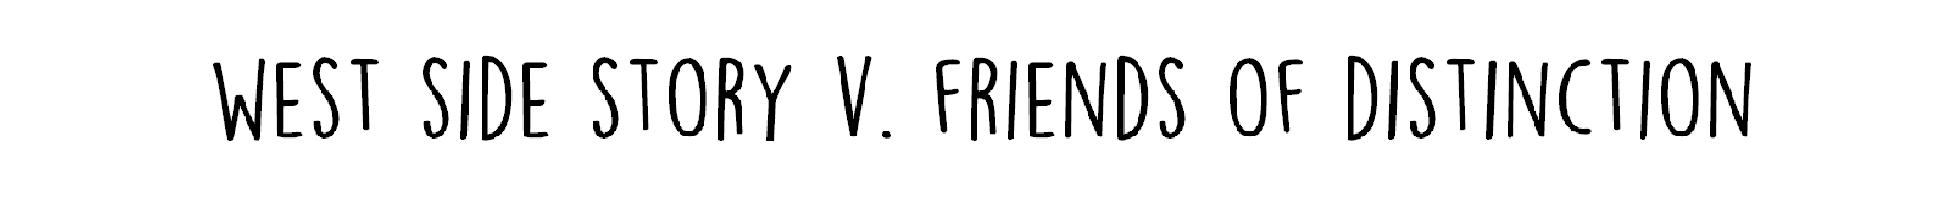 wss v friends